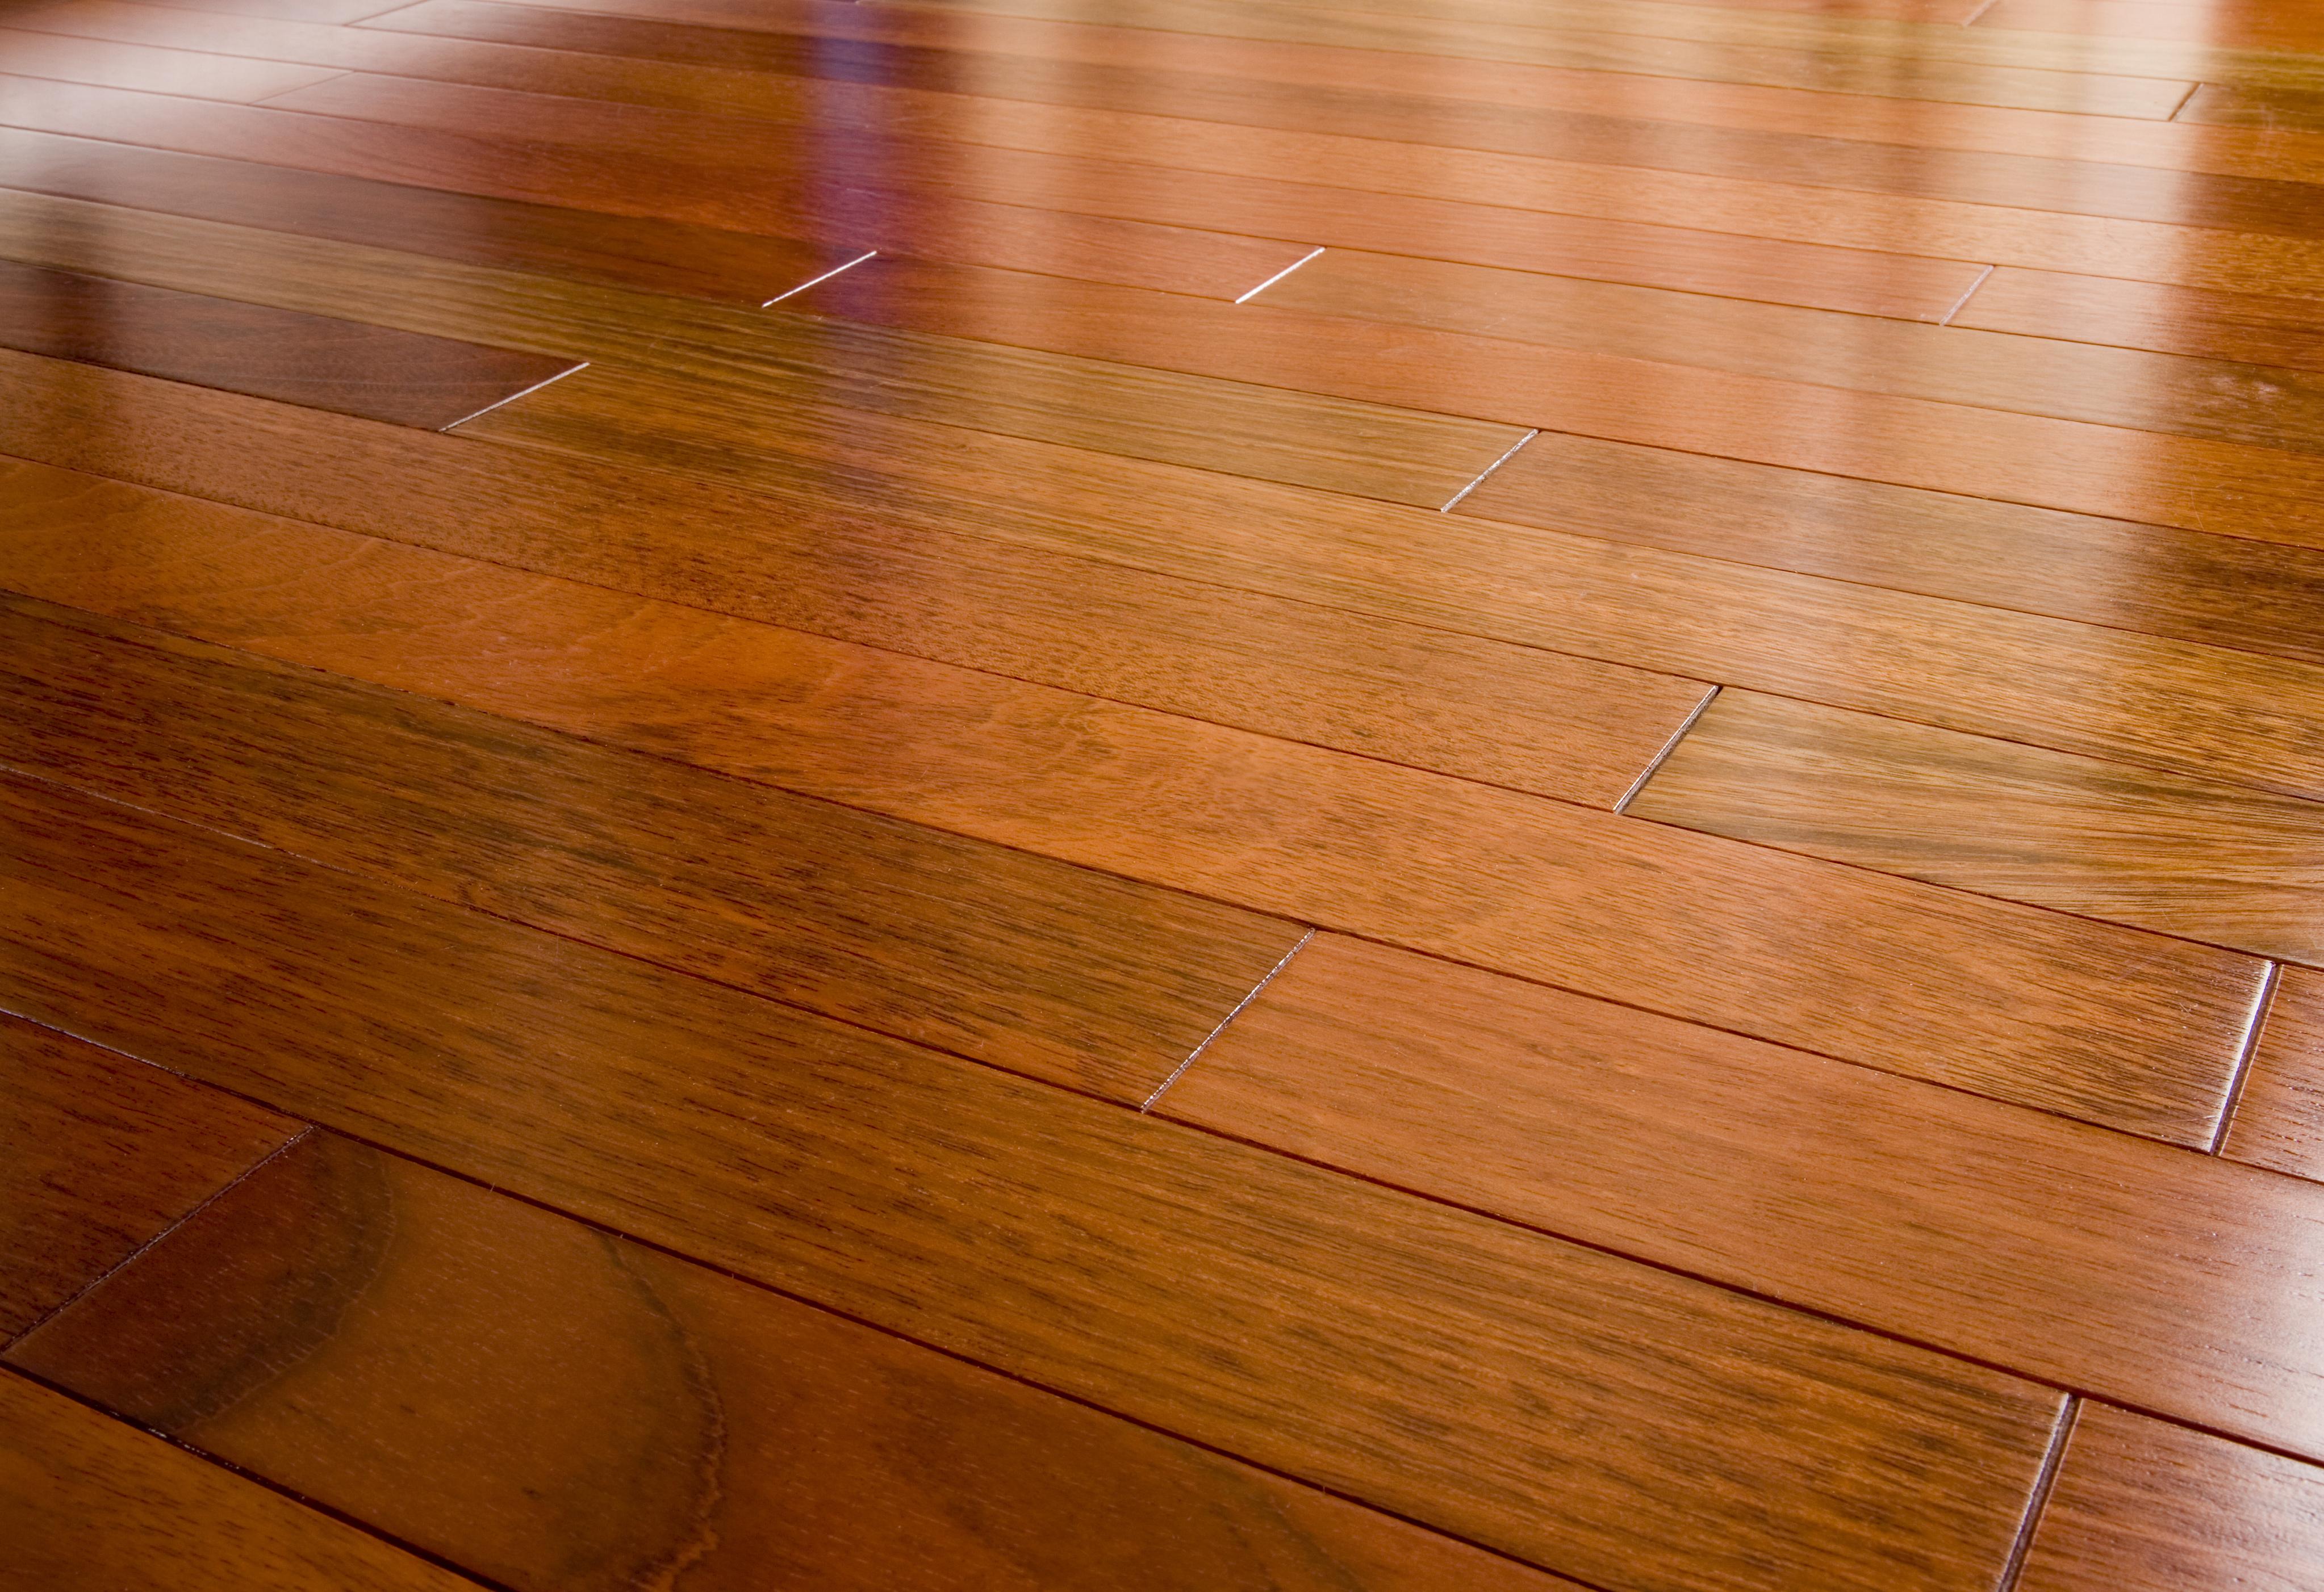 flooring wood having ... WLNFLEY